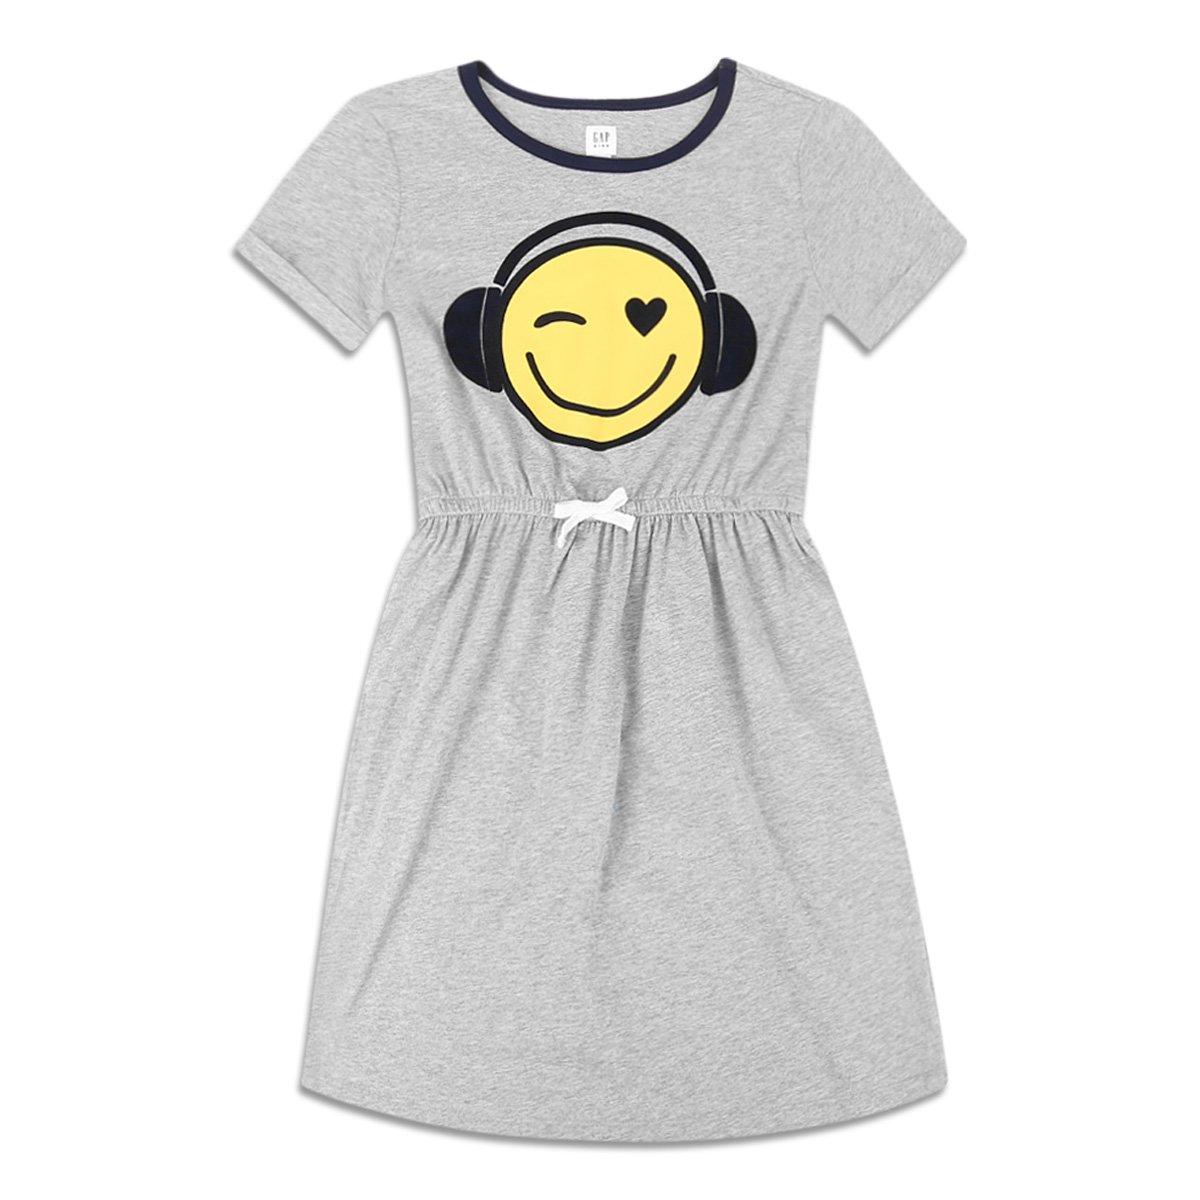 Vestido Infantil GAP Smile